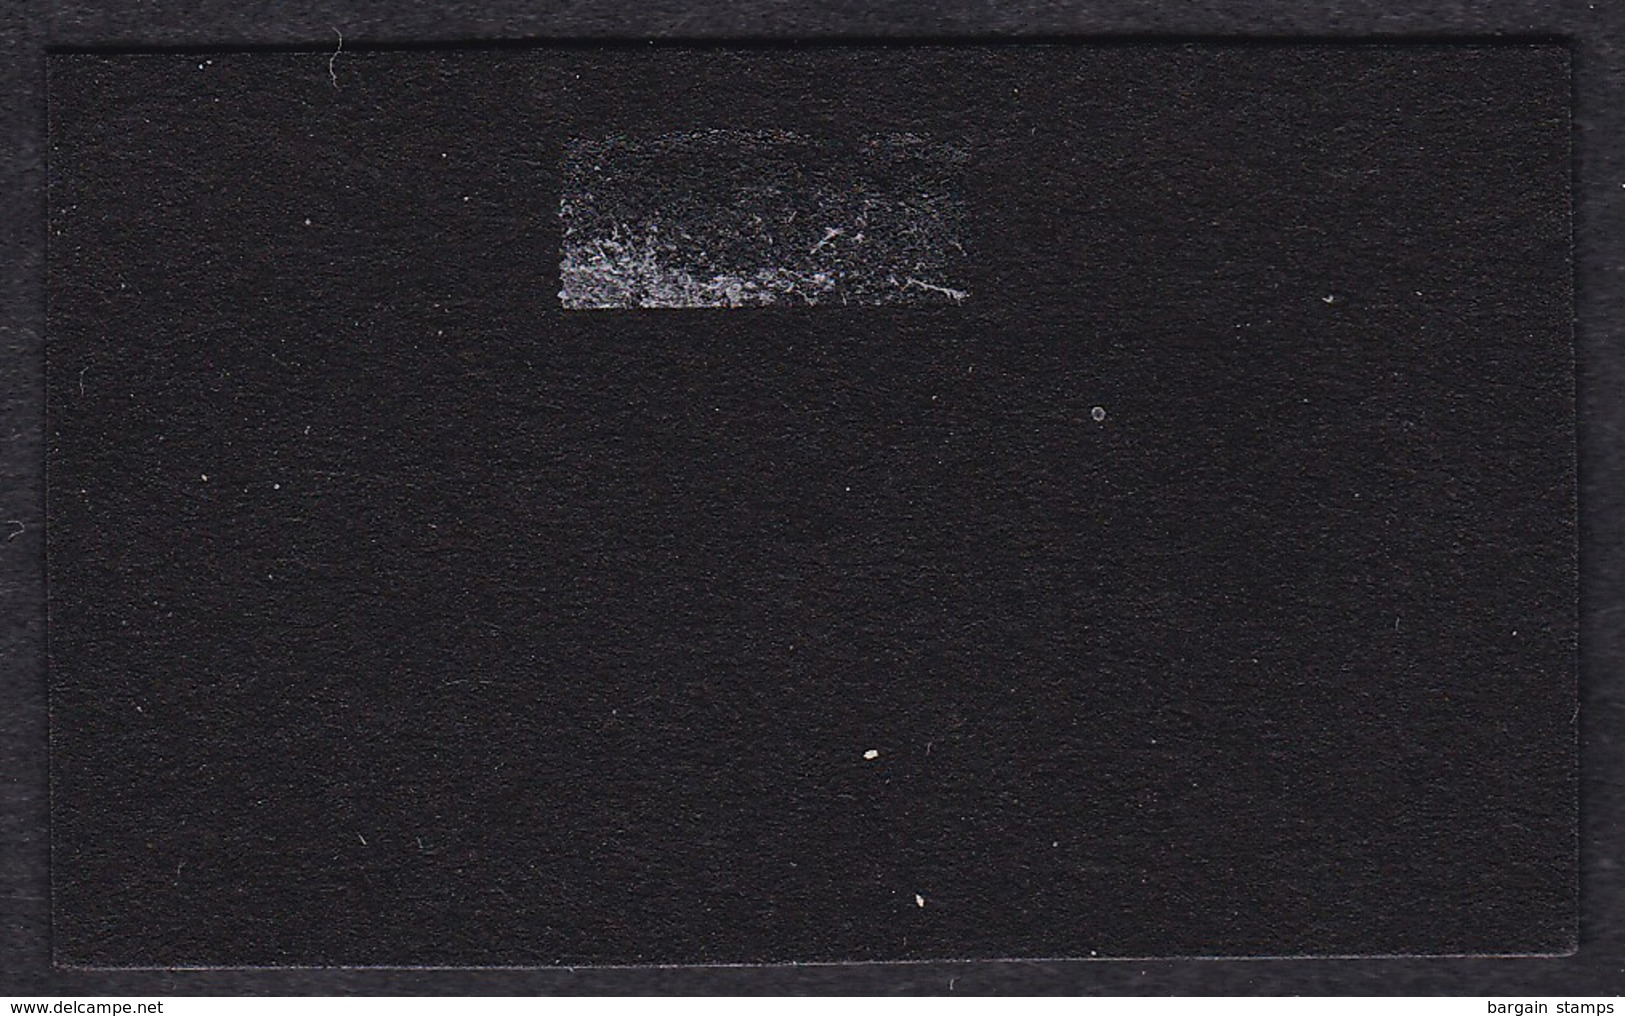 France Y&T 20 (2x) Oblitération GC 5073 Téniet-el-Haad - Alger - Marcophily (detached Stamps)